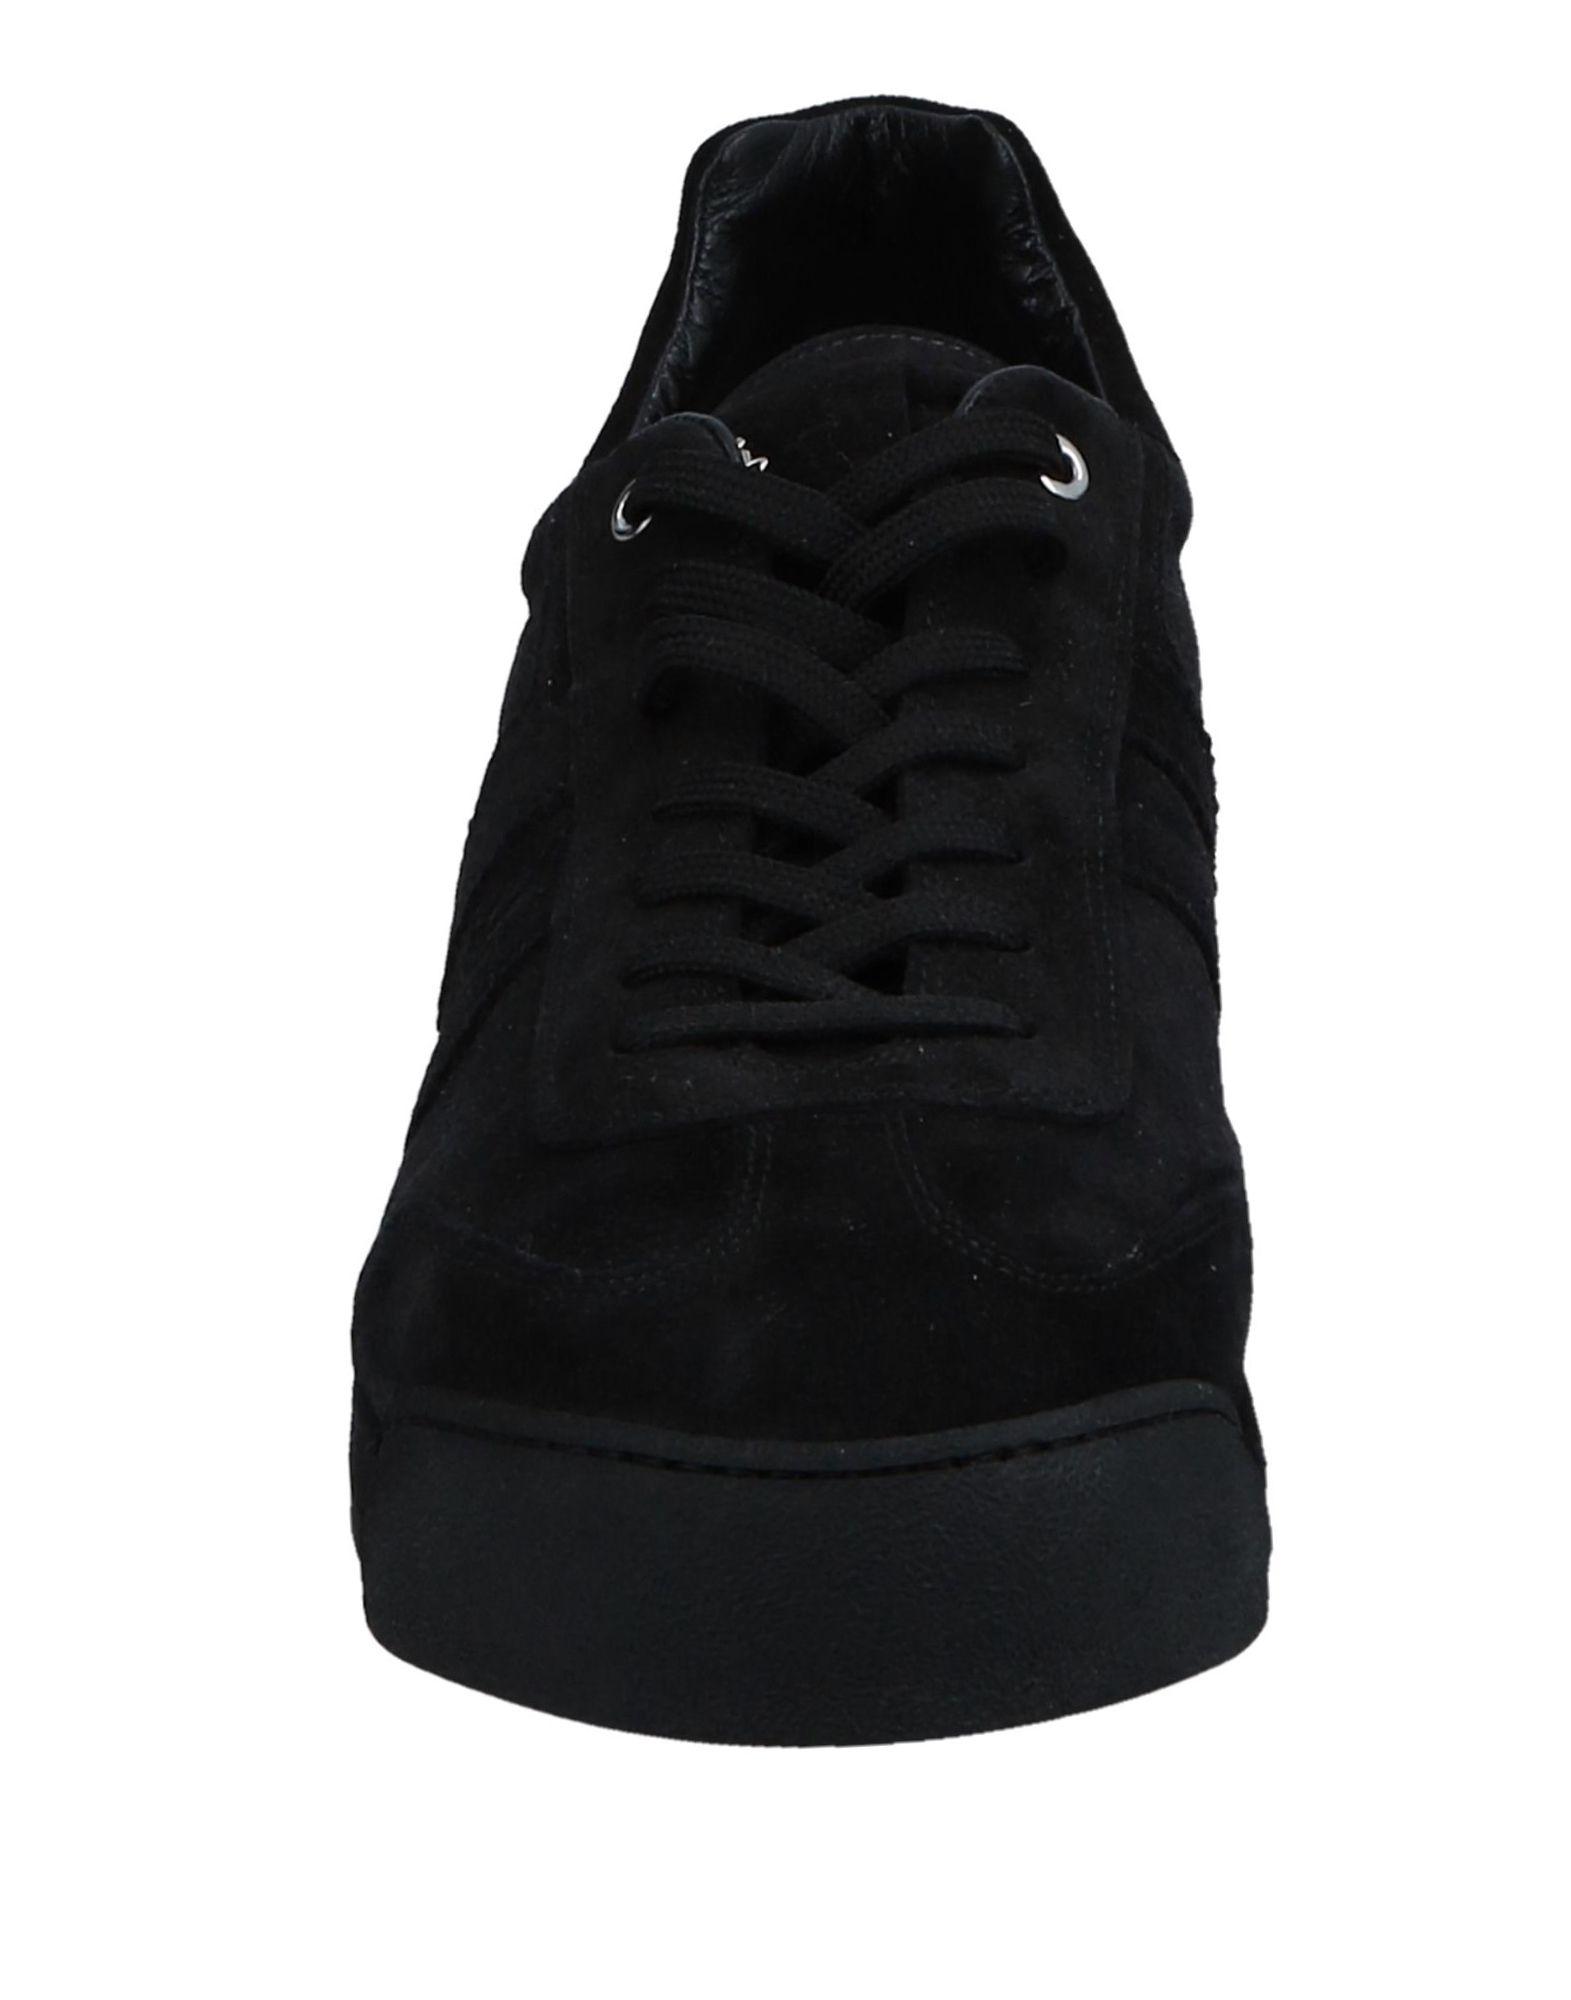 Rabatt echte Schuhe Cesare Paciotti 11505527LO 4Us Sneakers Herren  11505527LO Paciotti 18f679